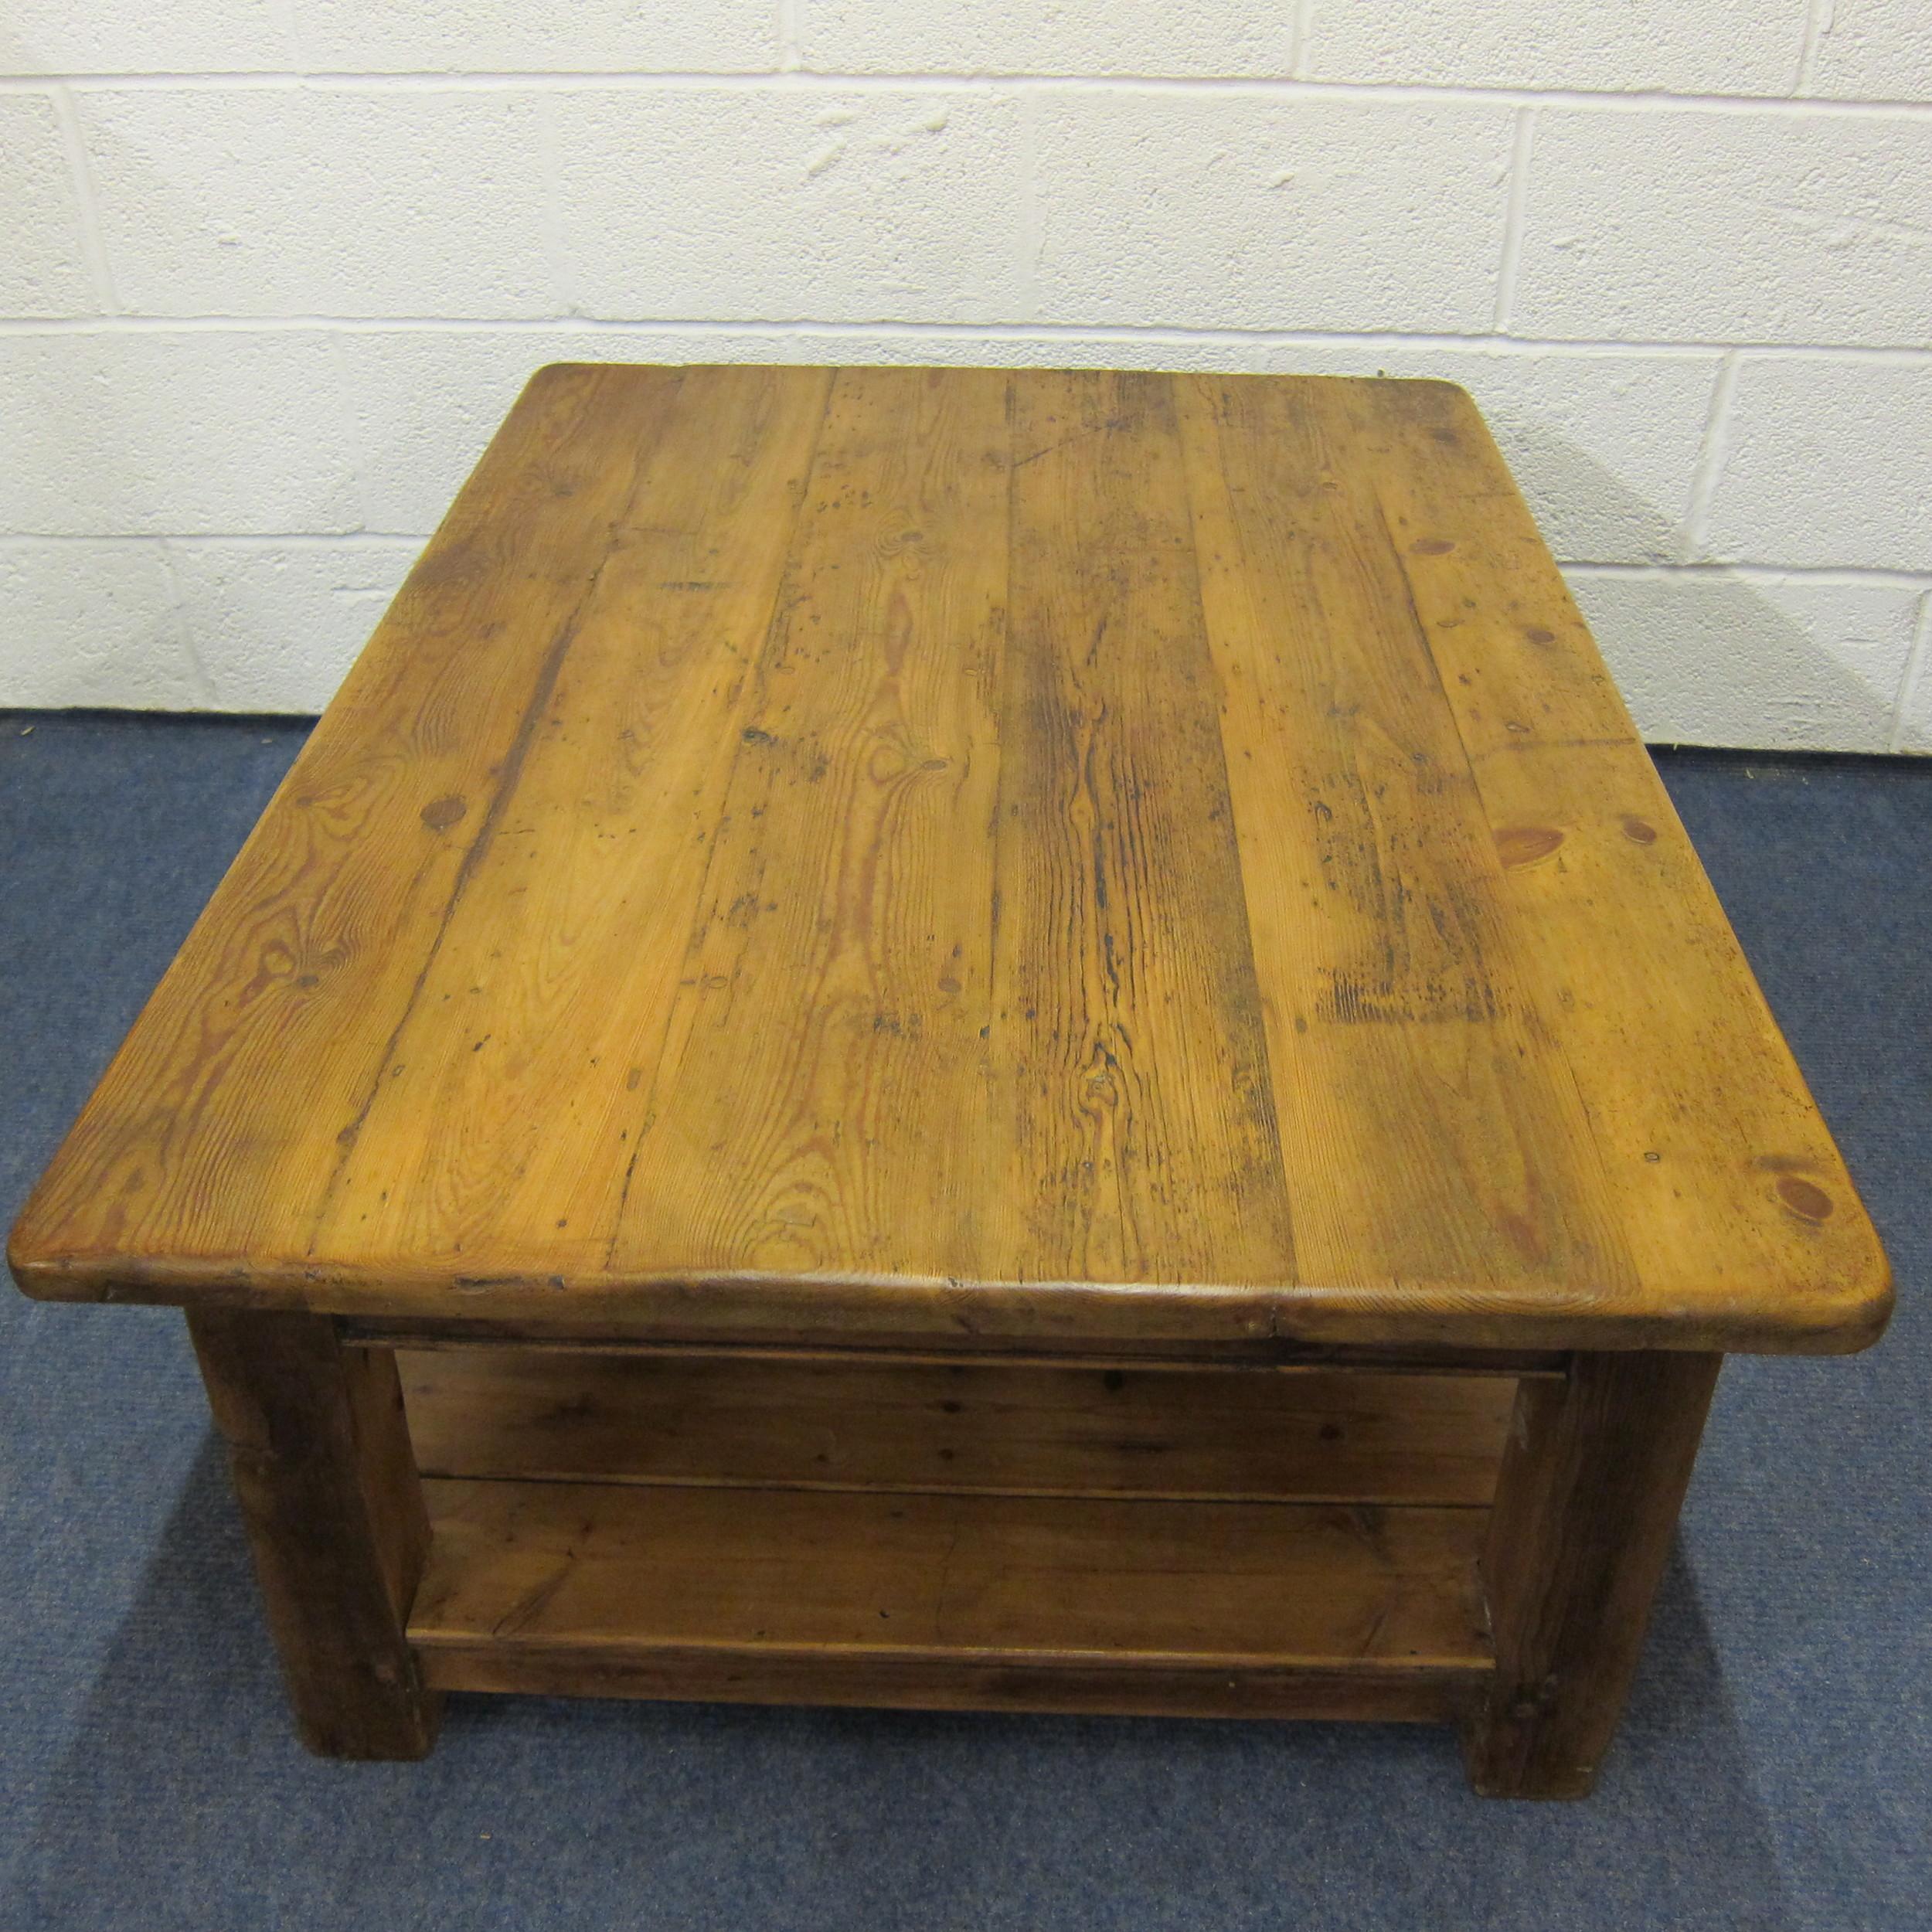 Waxed old pine floorboard table top